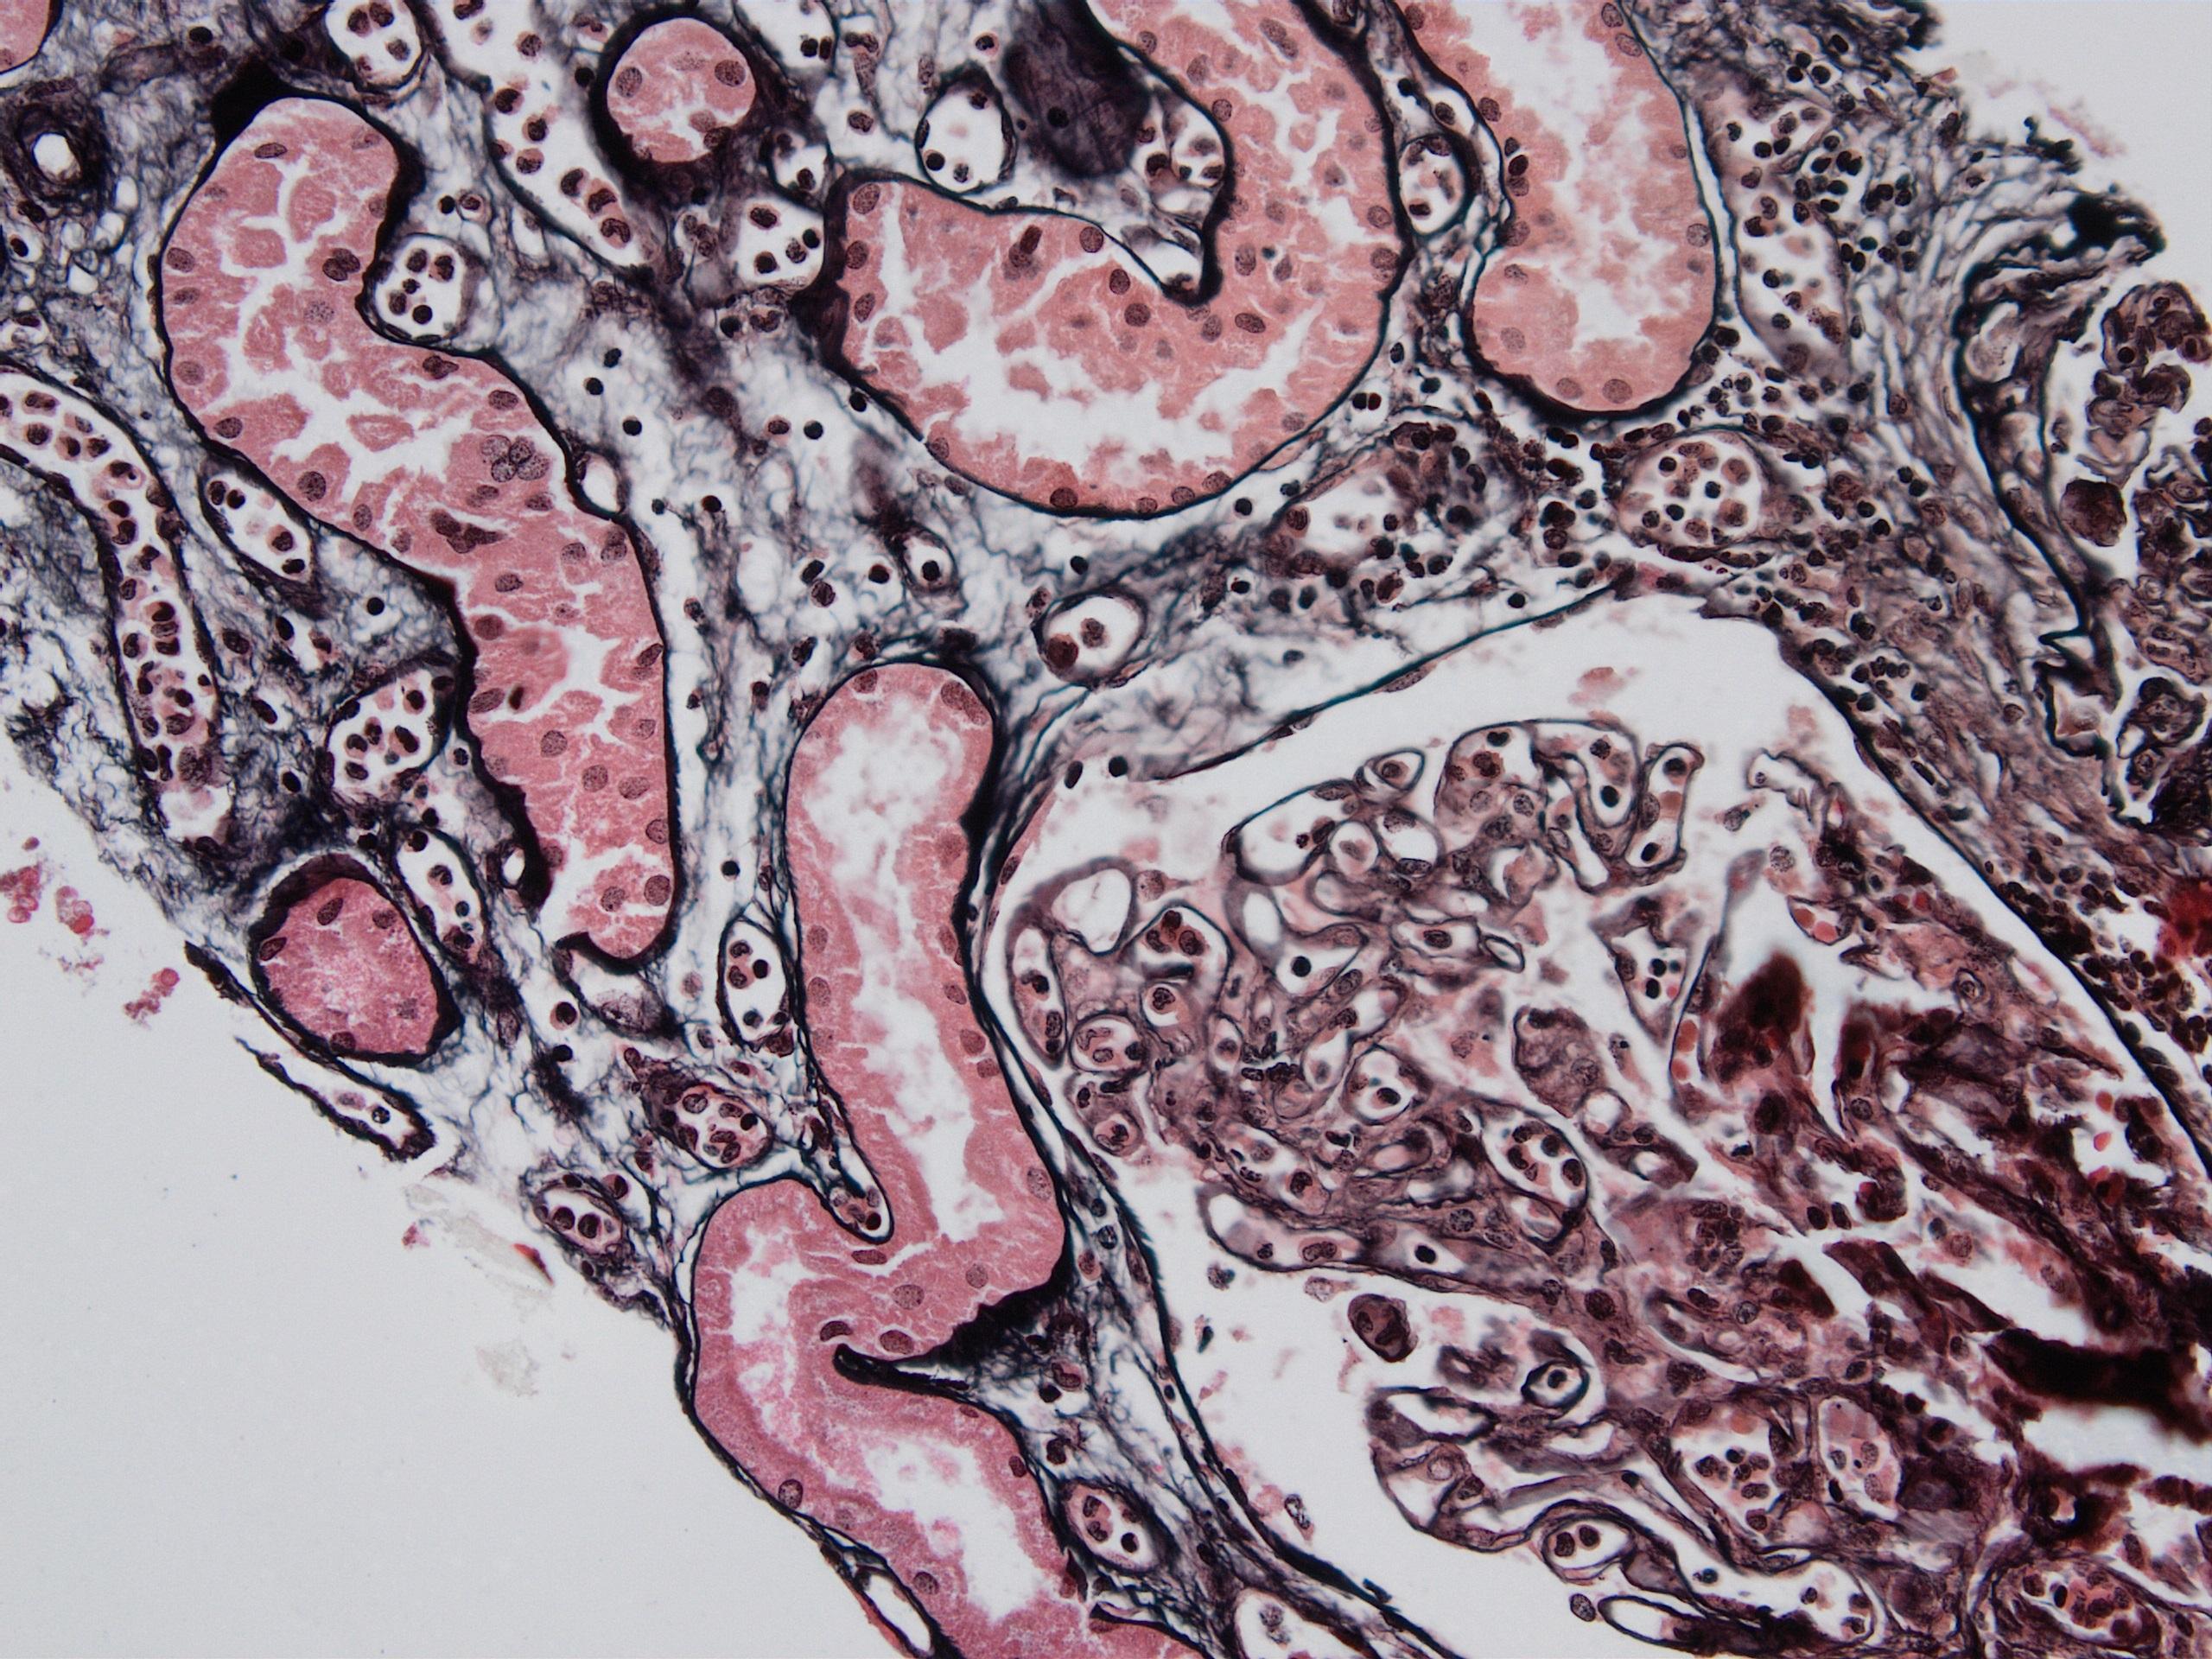 Chronic active ABMR, JMS stain